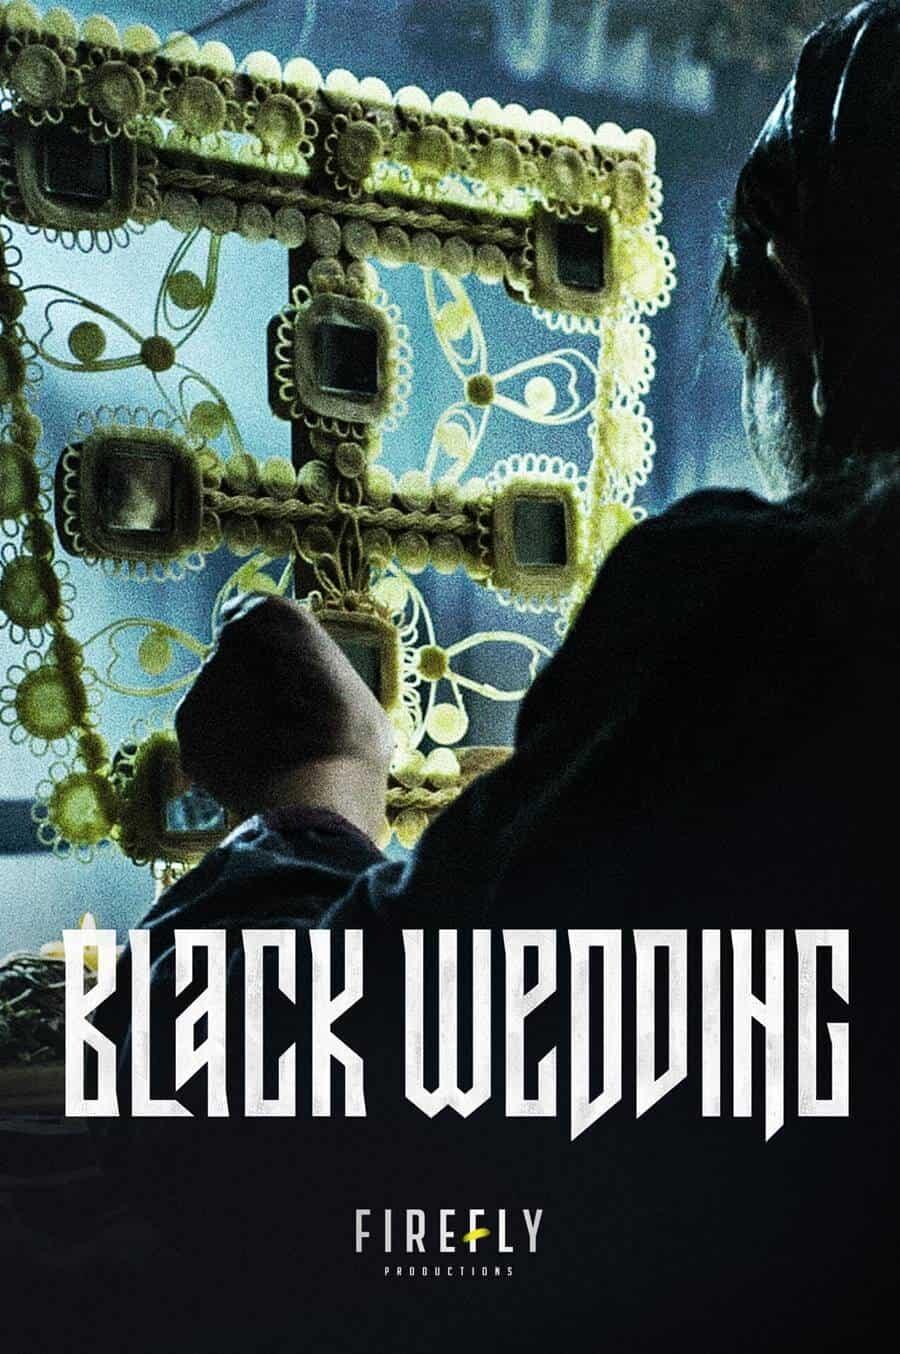 Crna svadba, foto Firefly Productions PROMO